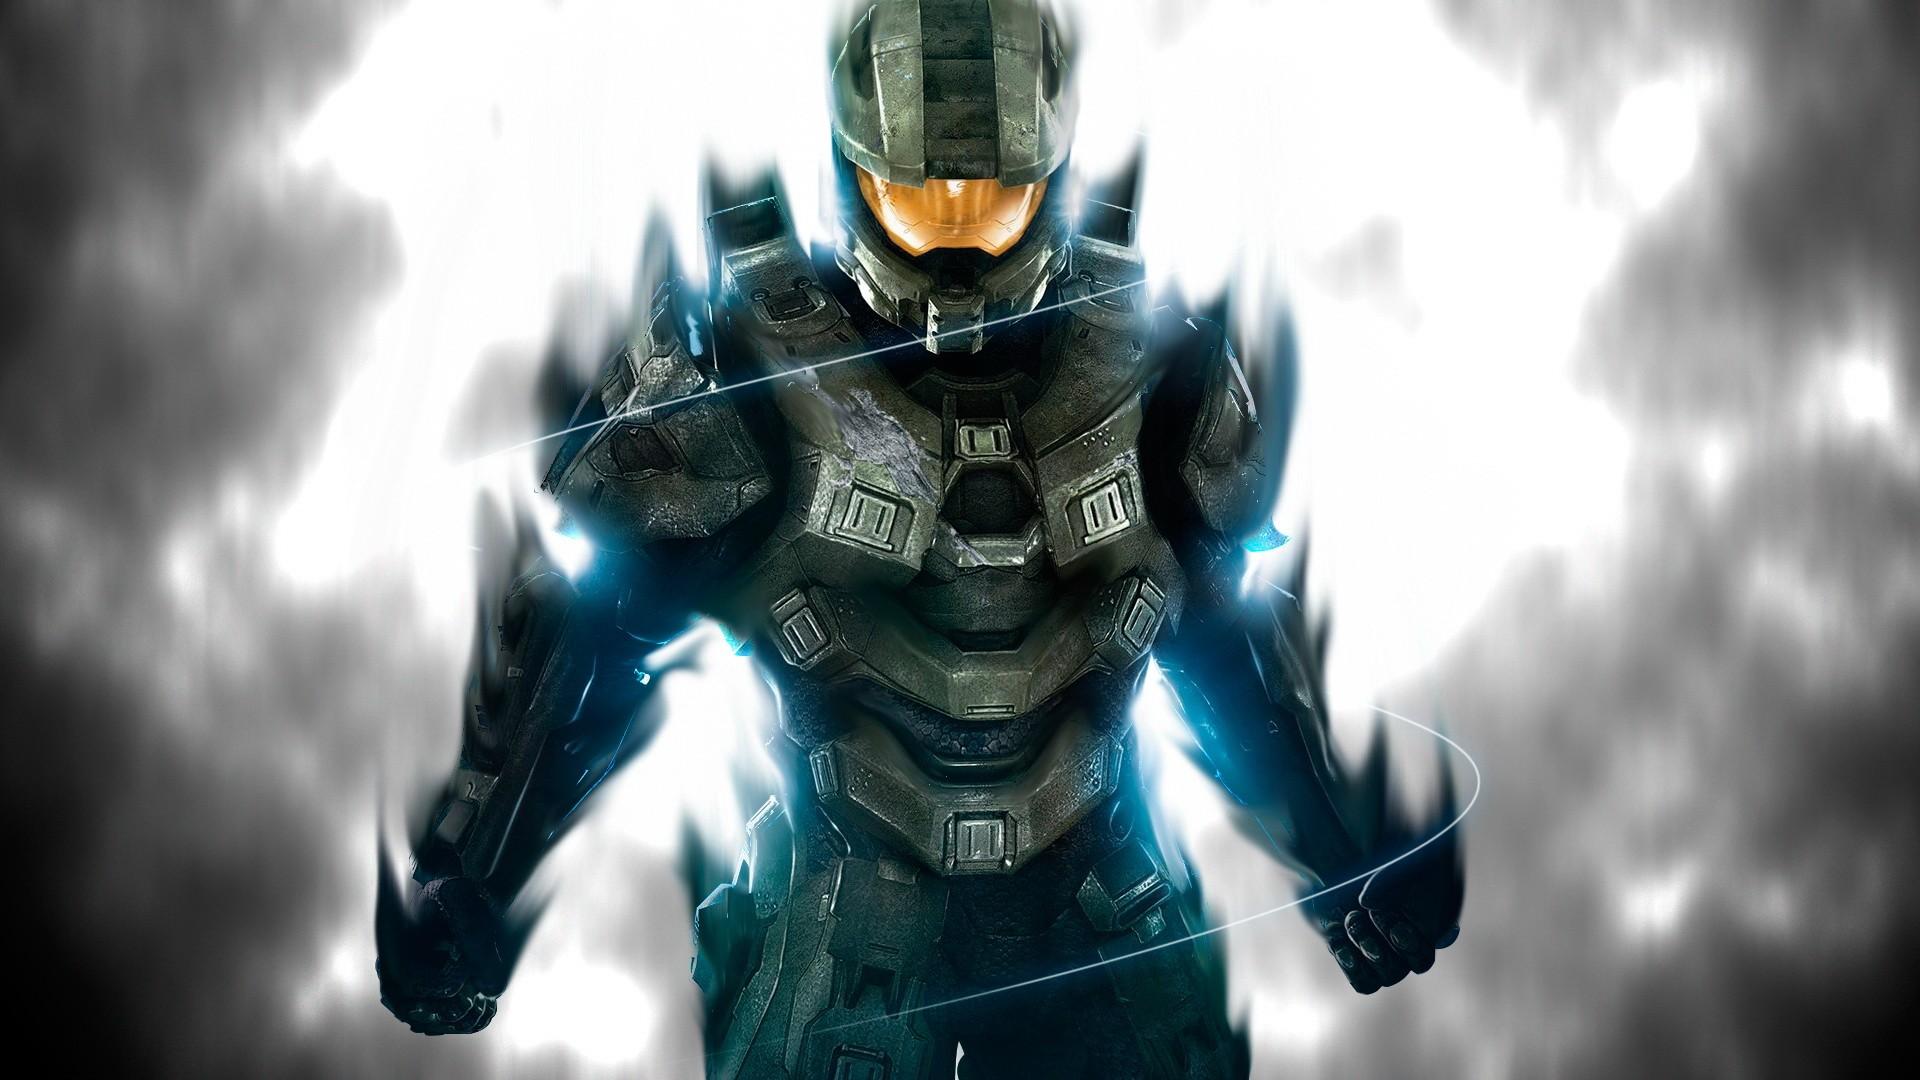 Halo 4 wallpaper 47